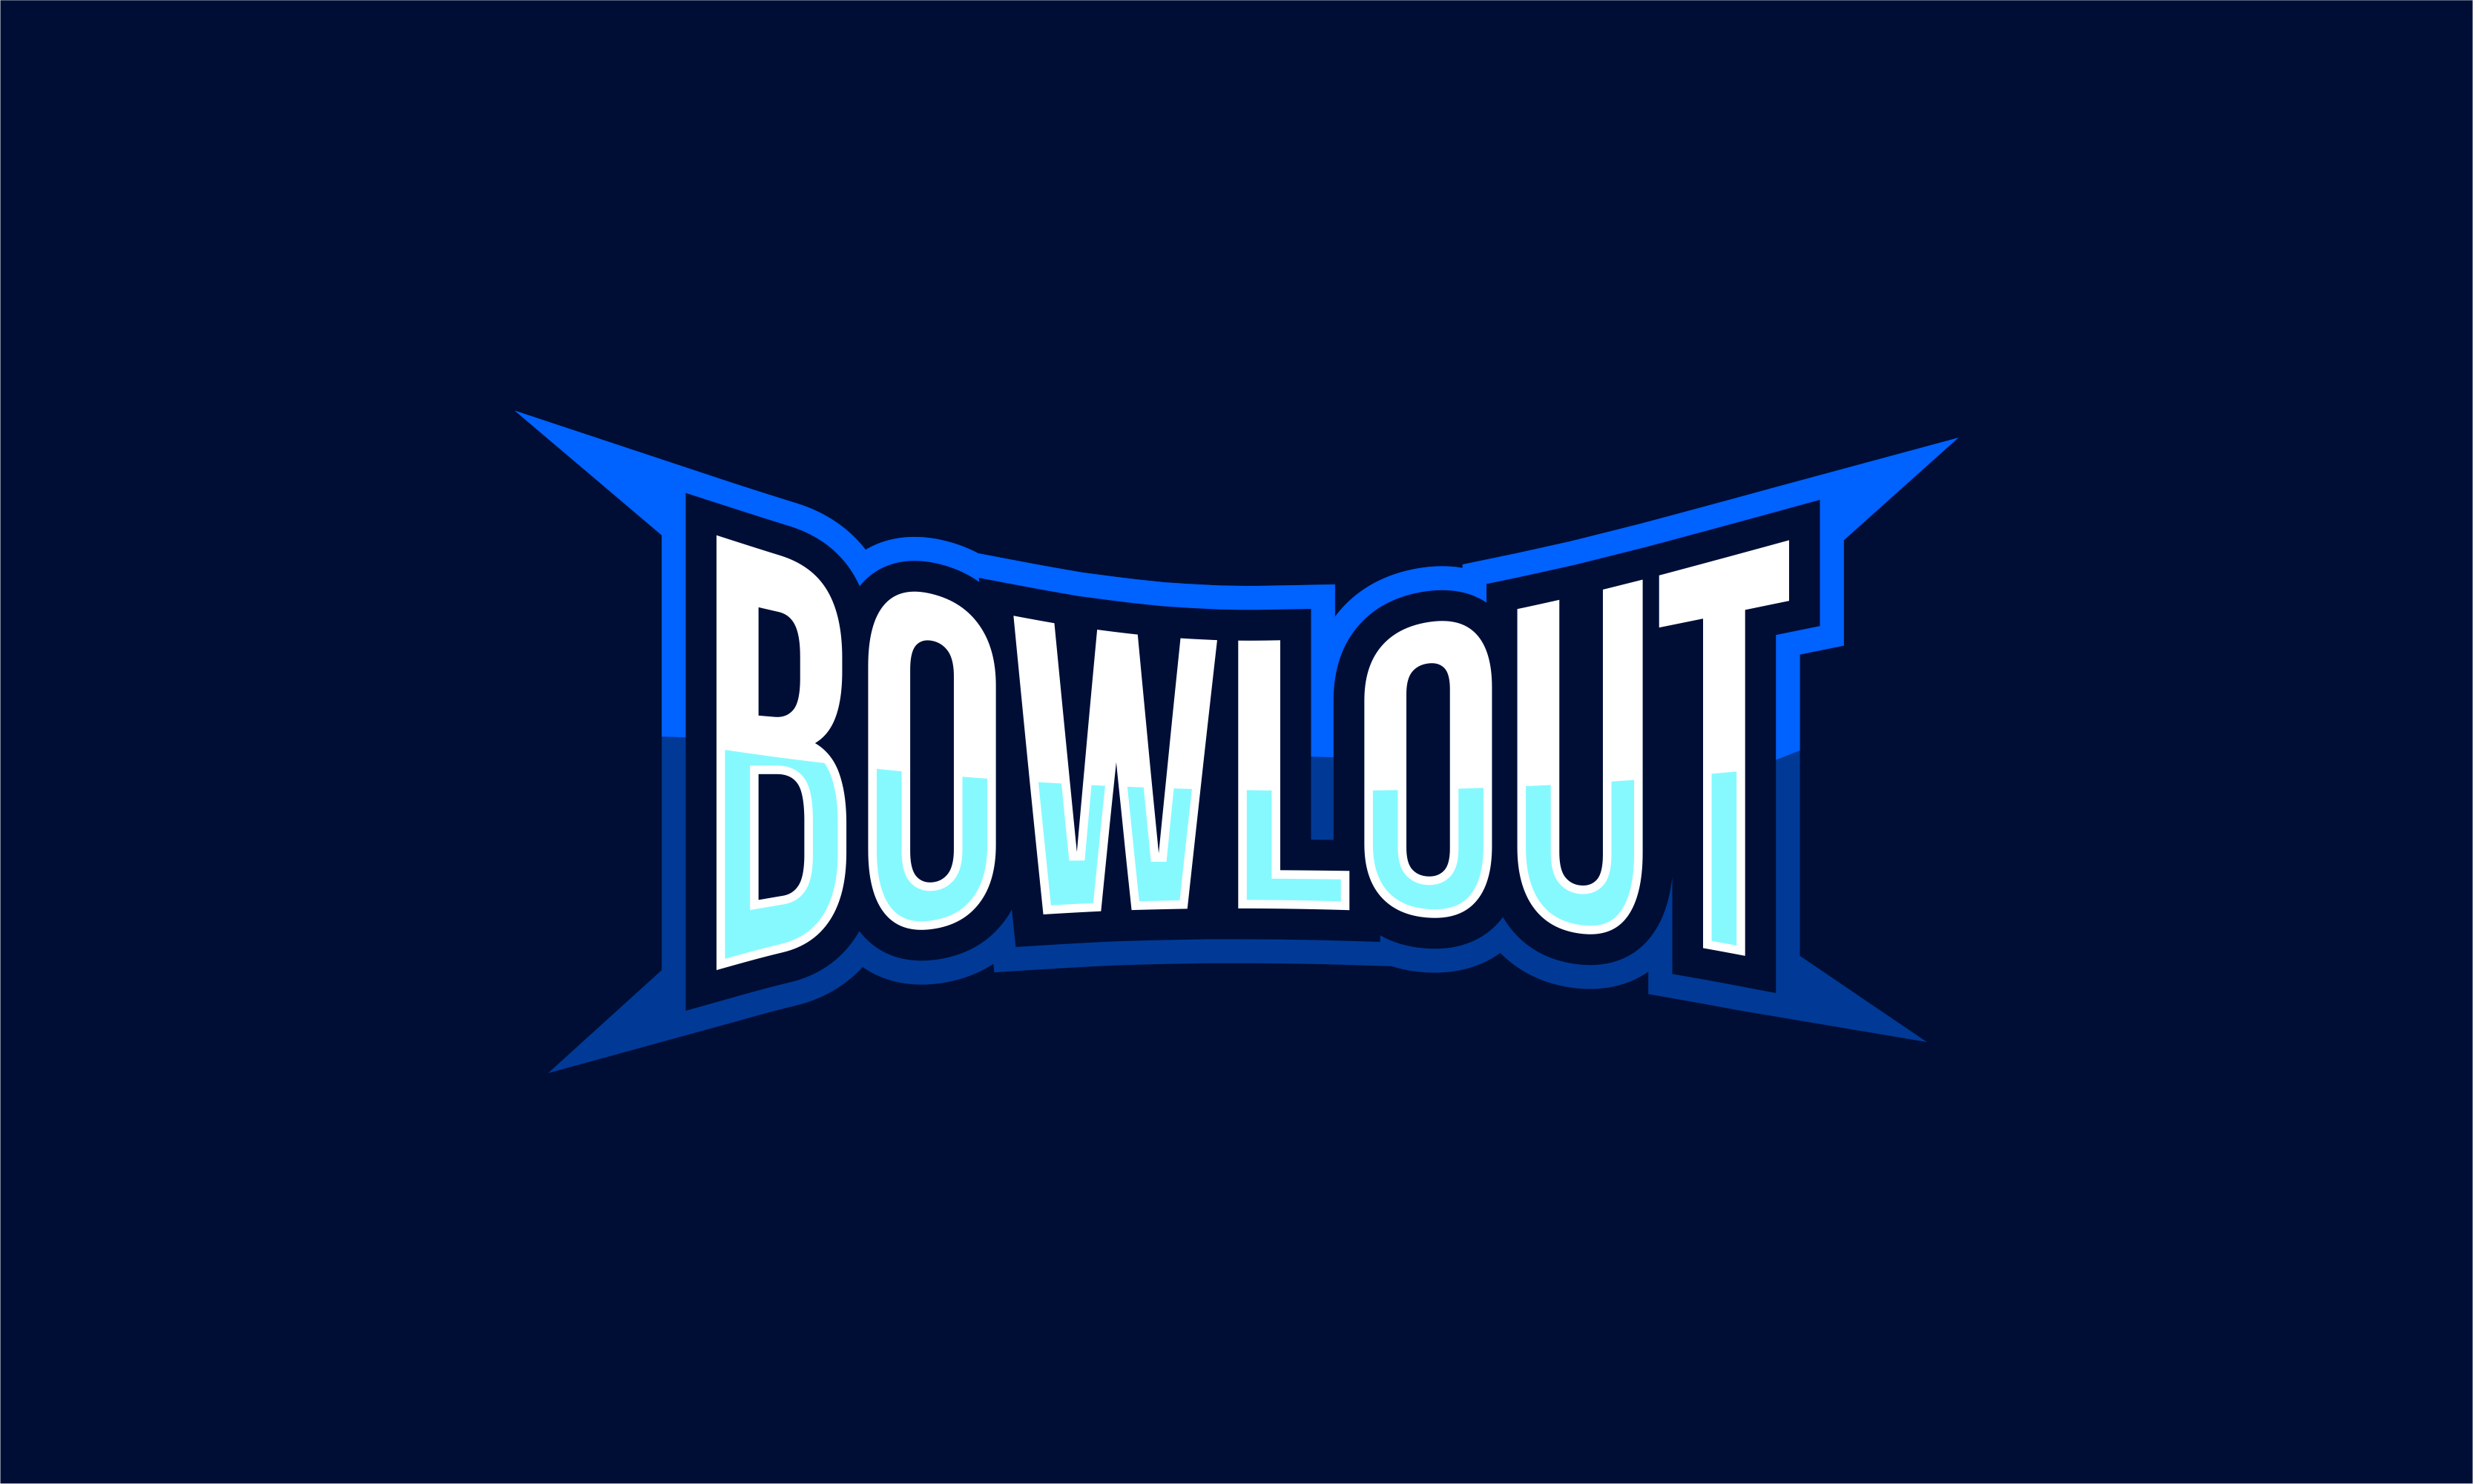 Bowlout